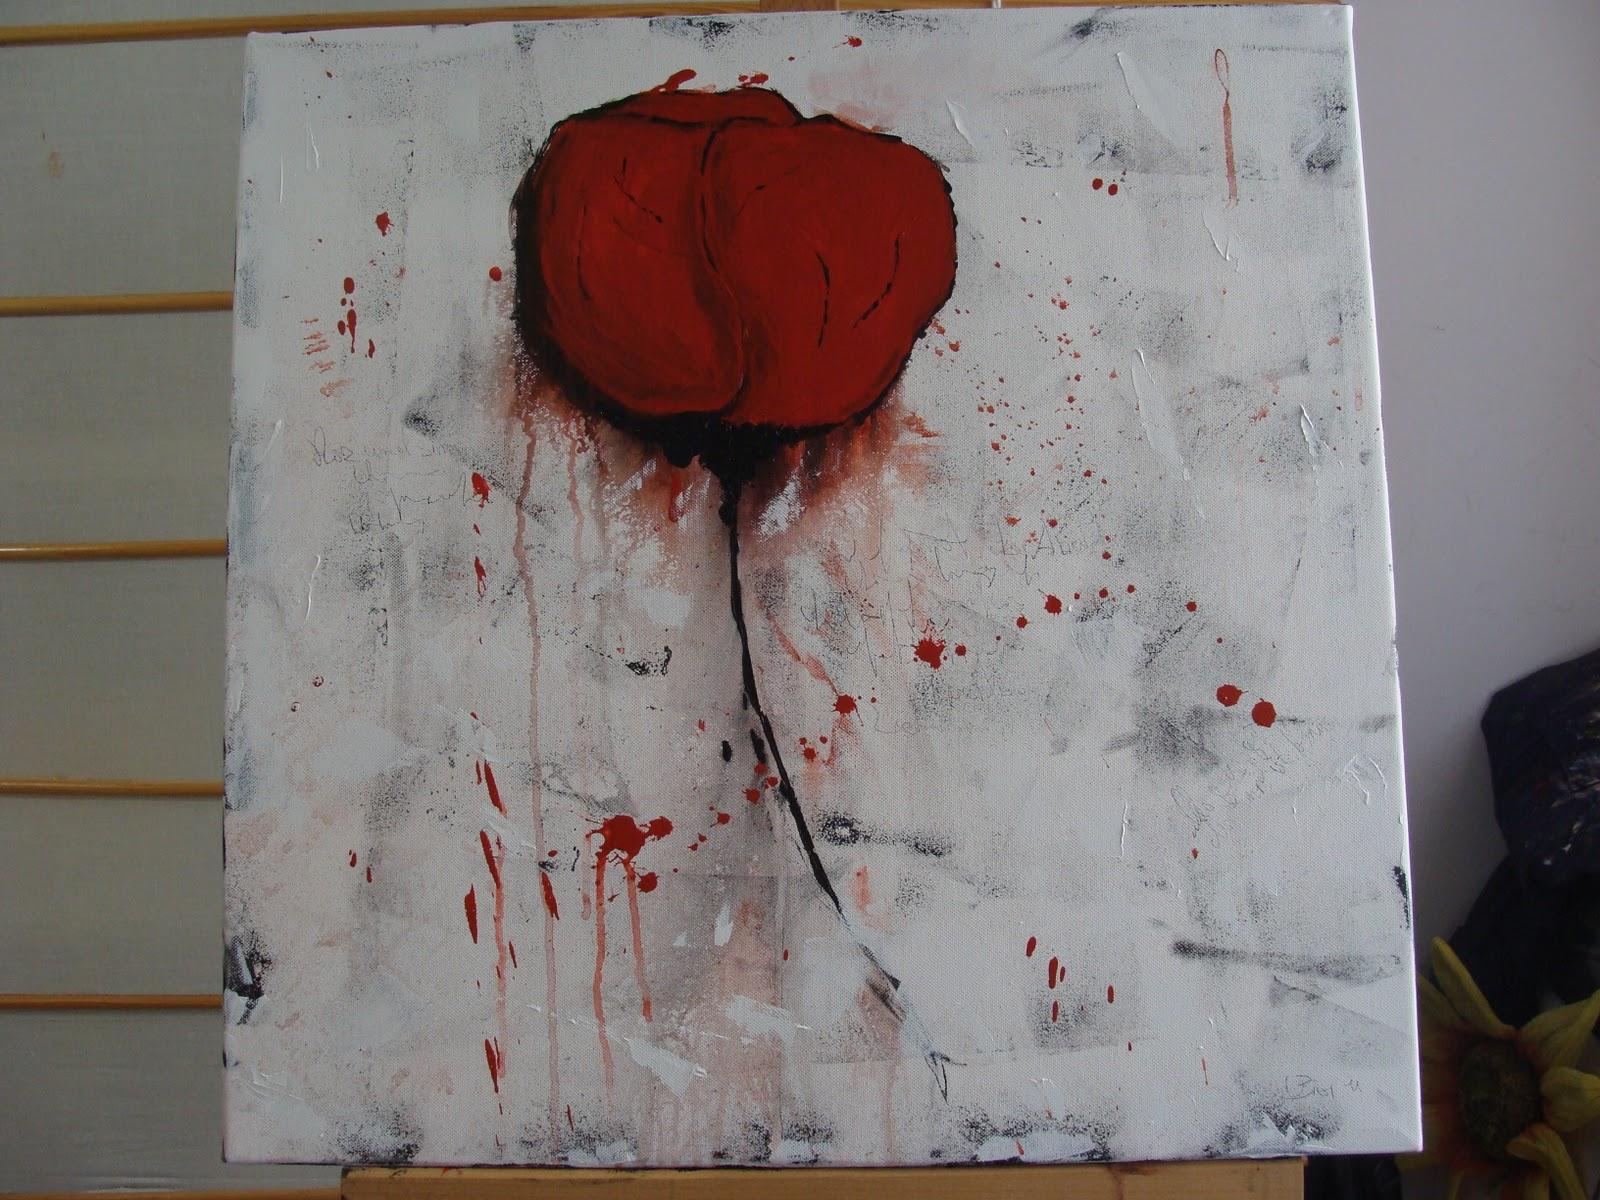 Leben mit der kunst oktober 2011 - Acrylmalerei ideen ...